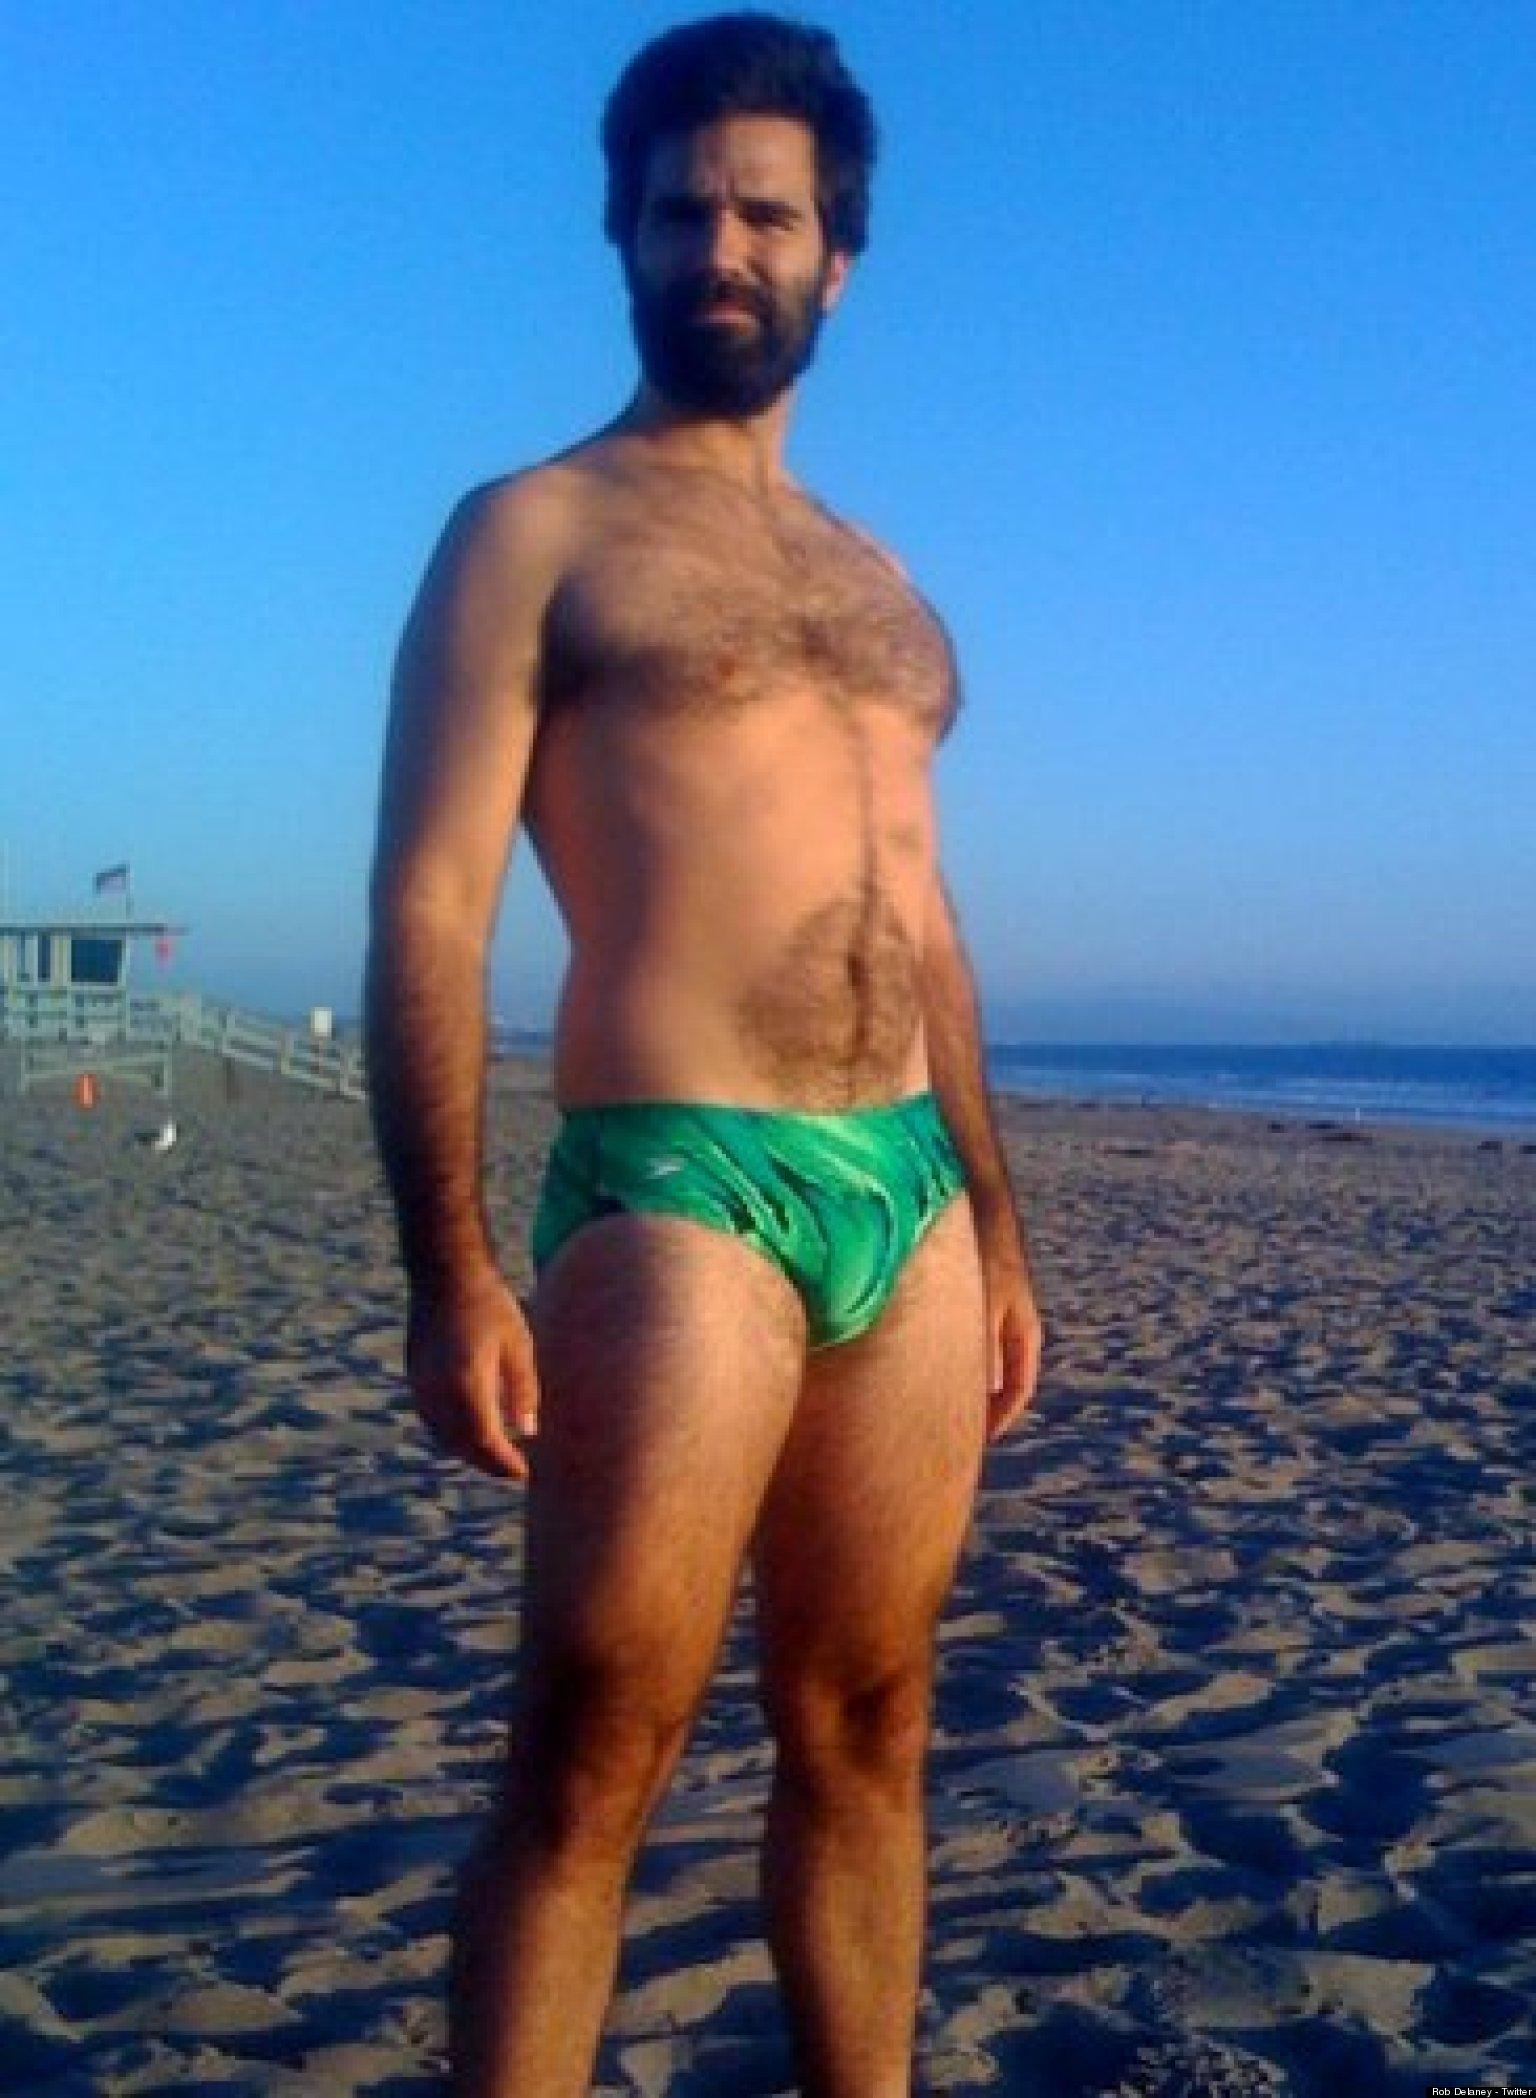 Hot men Naked post op transgender having sex